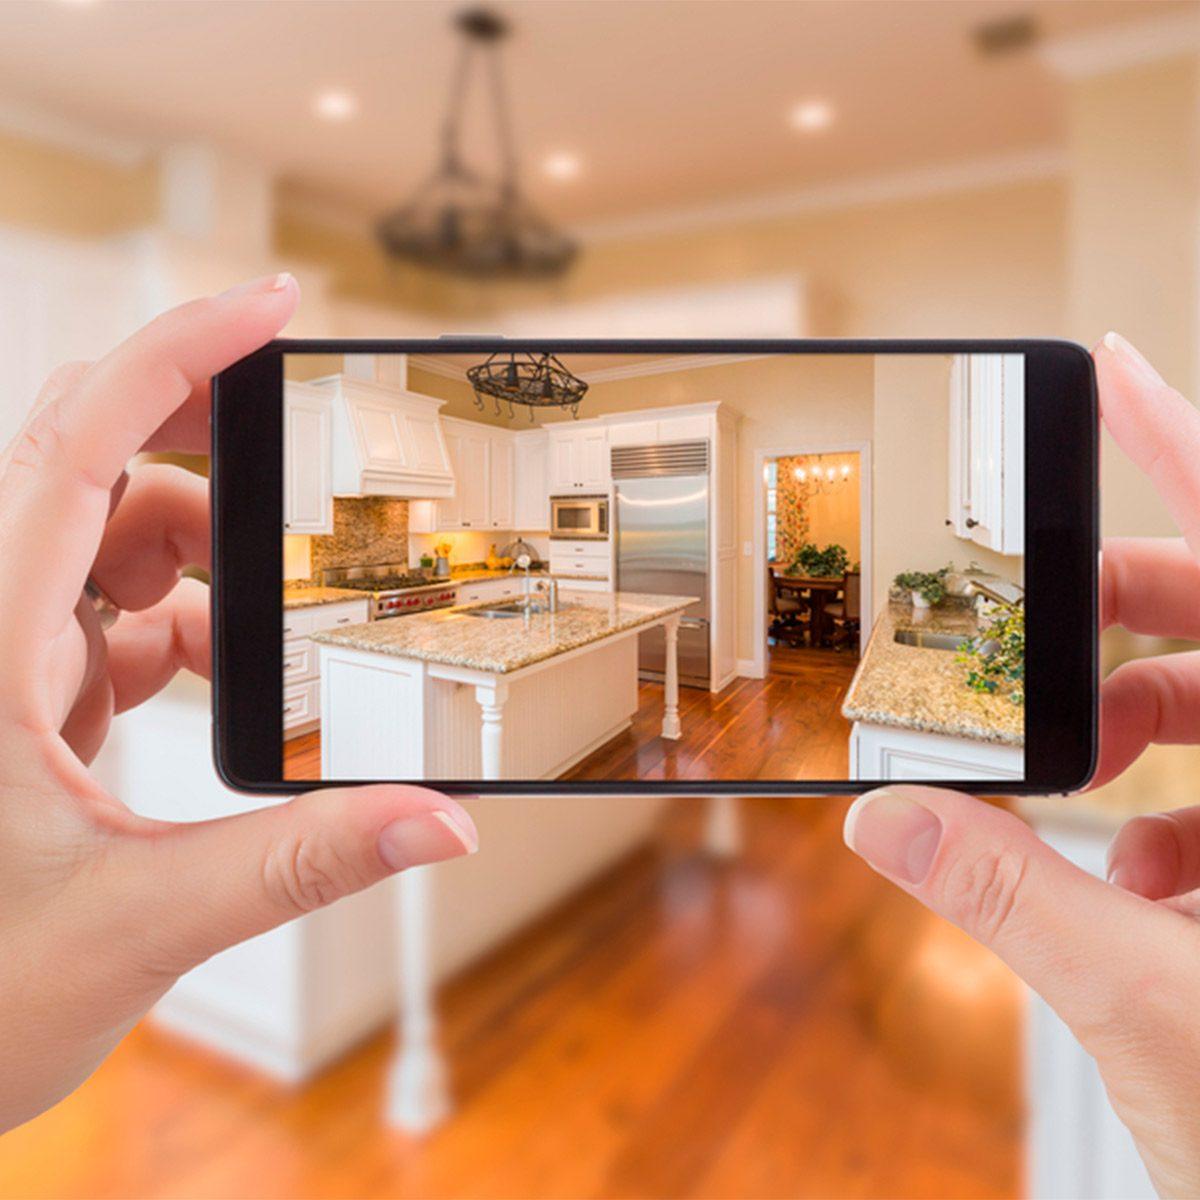 smartphone photo of kitchen